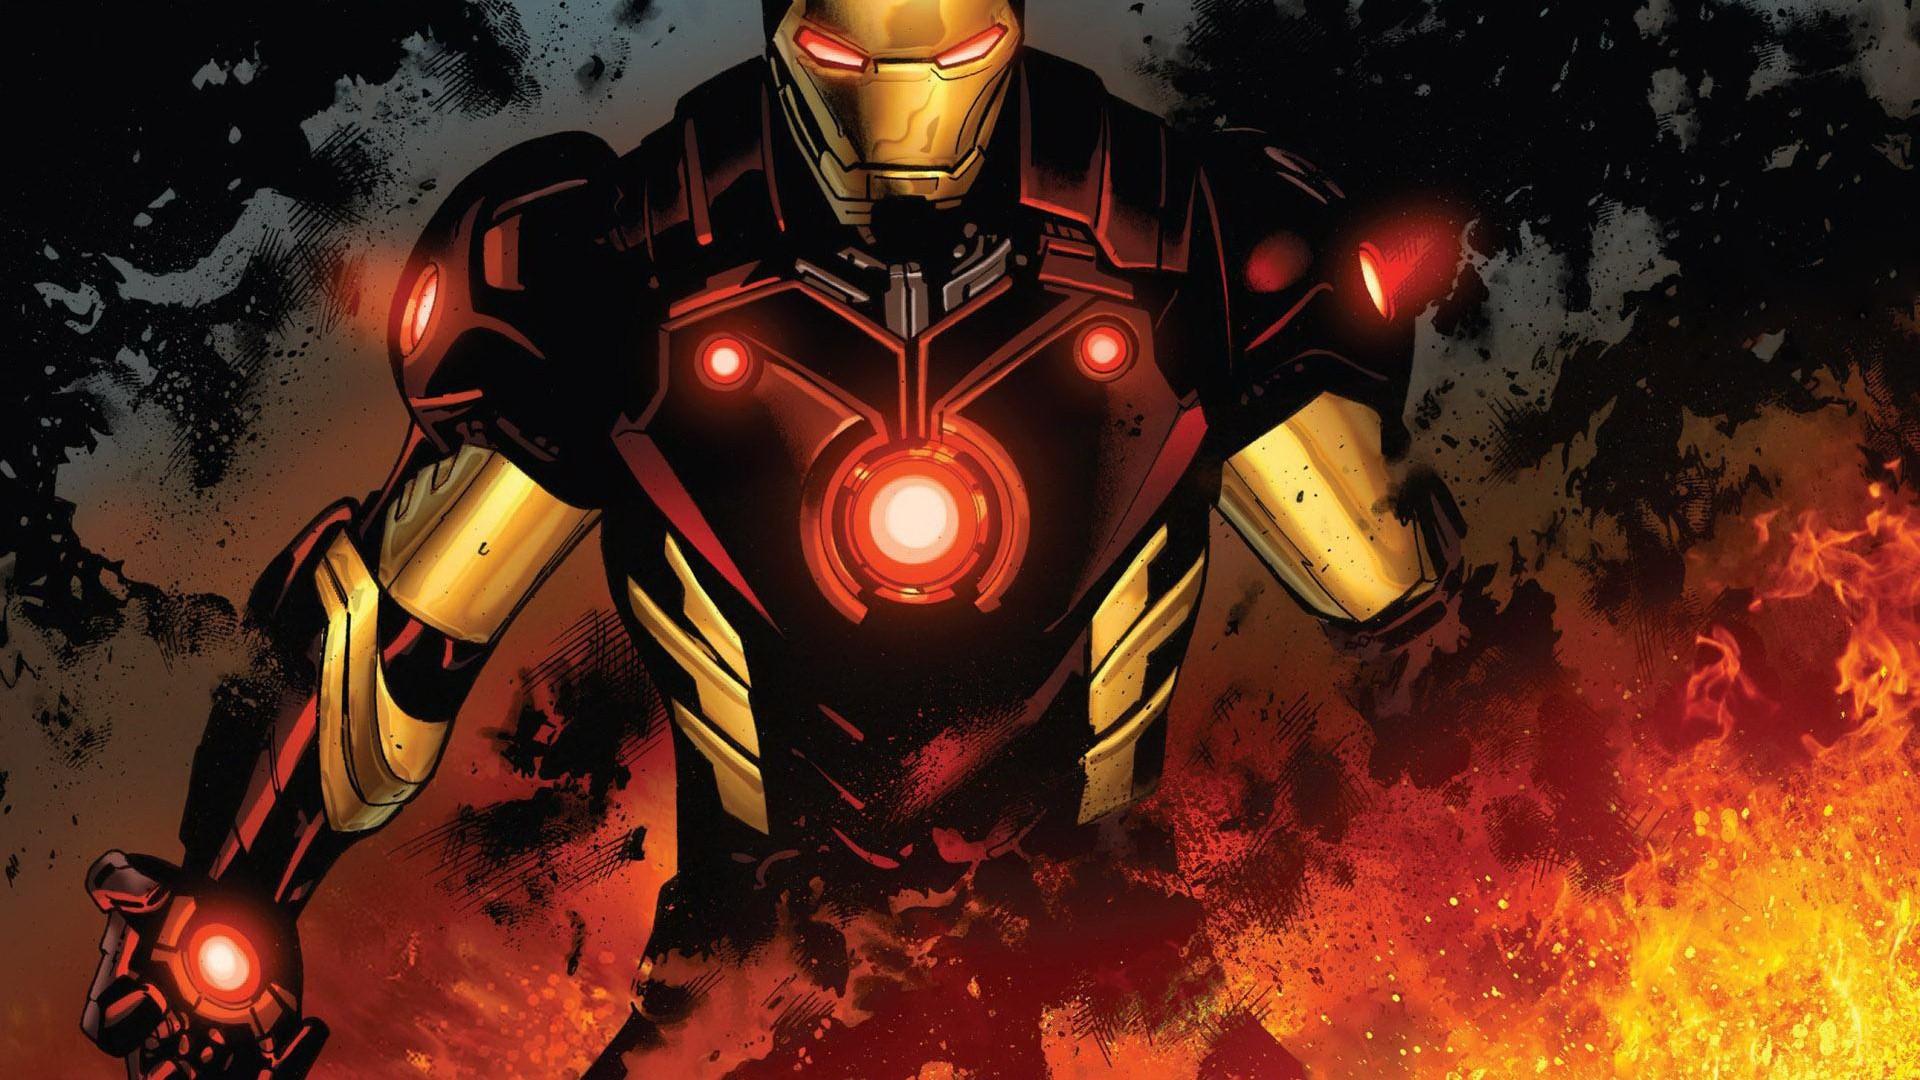 Iron Man Comic Wallpapers Widescreen - Wickedsa com